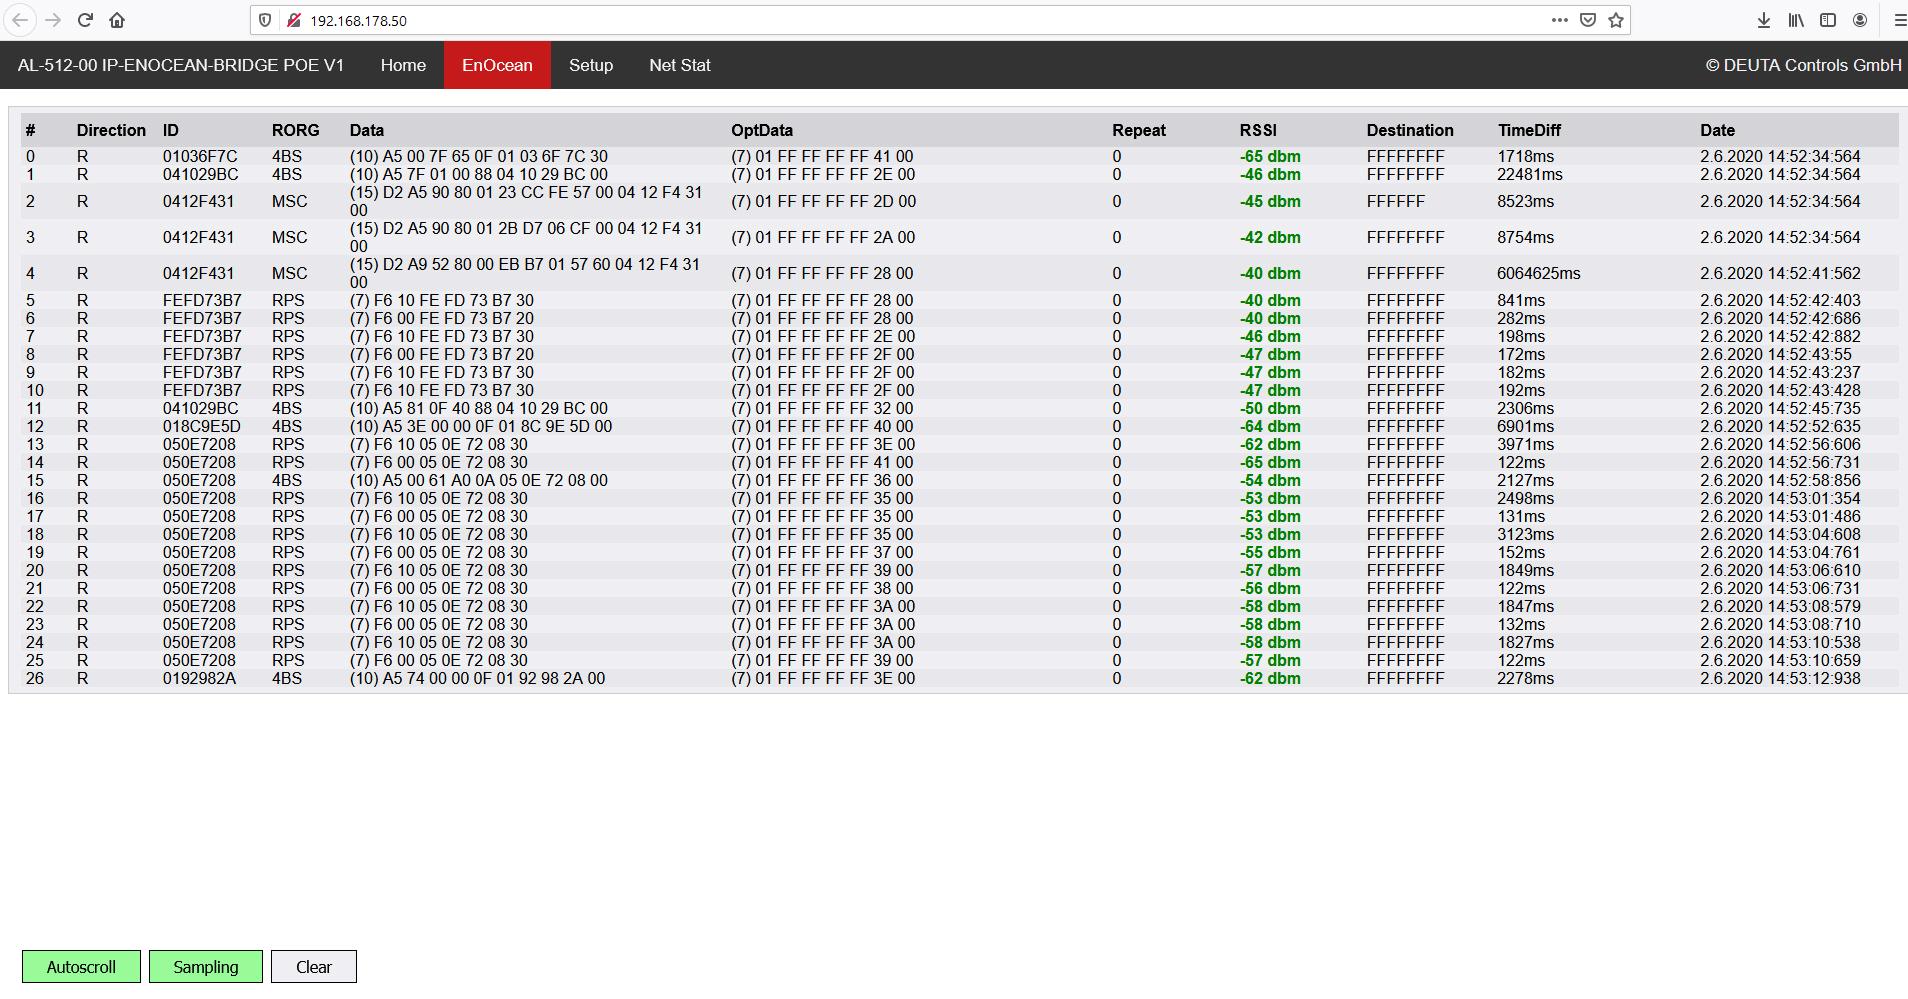 Webserver EnOcean Monitor AL-512-00 IP-ENOCEAN-BRIDGE 12184 DEUTA Controls